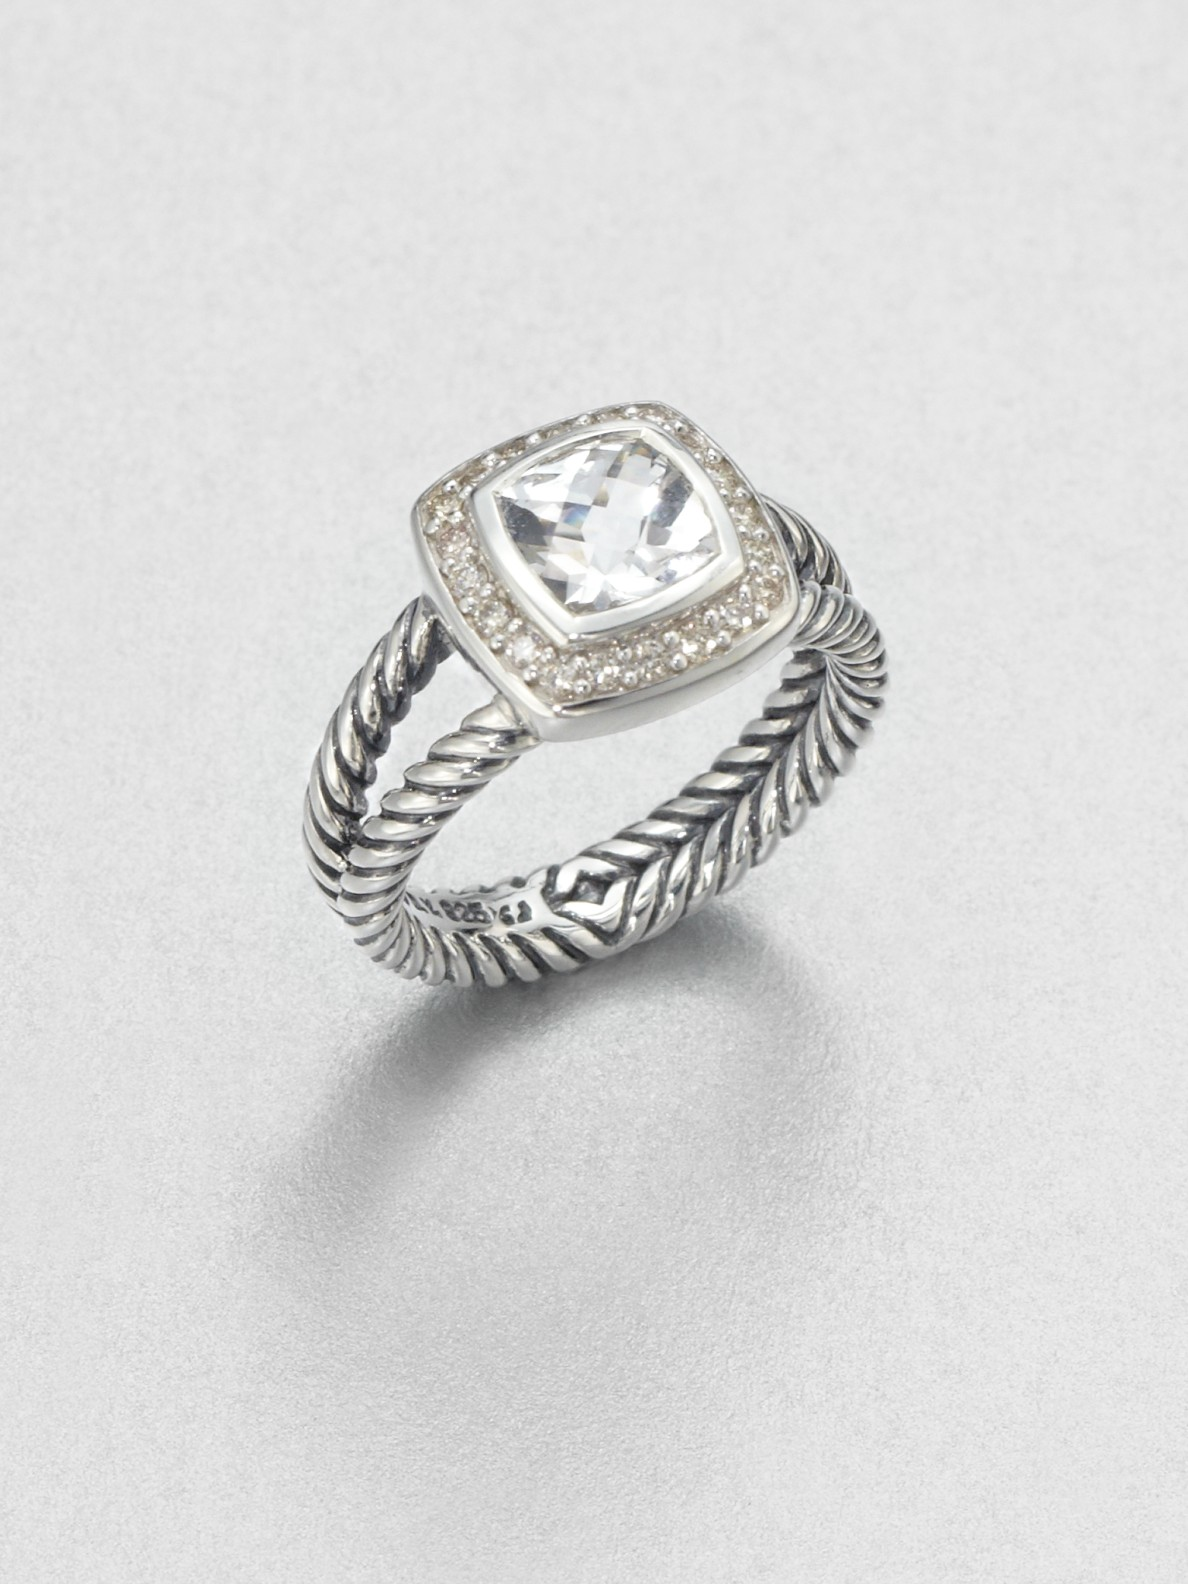 david yurman accented white topaz sterling silver